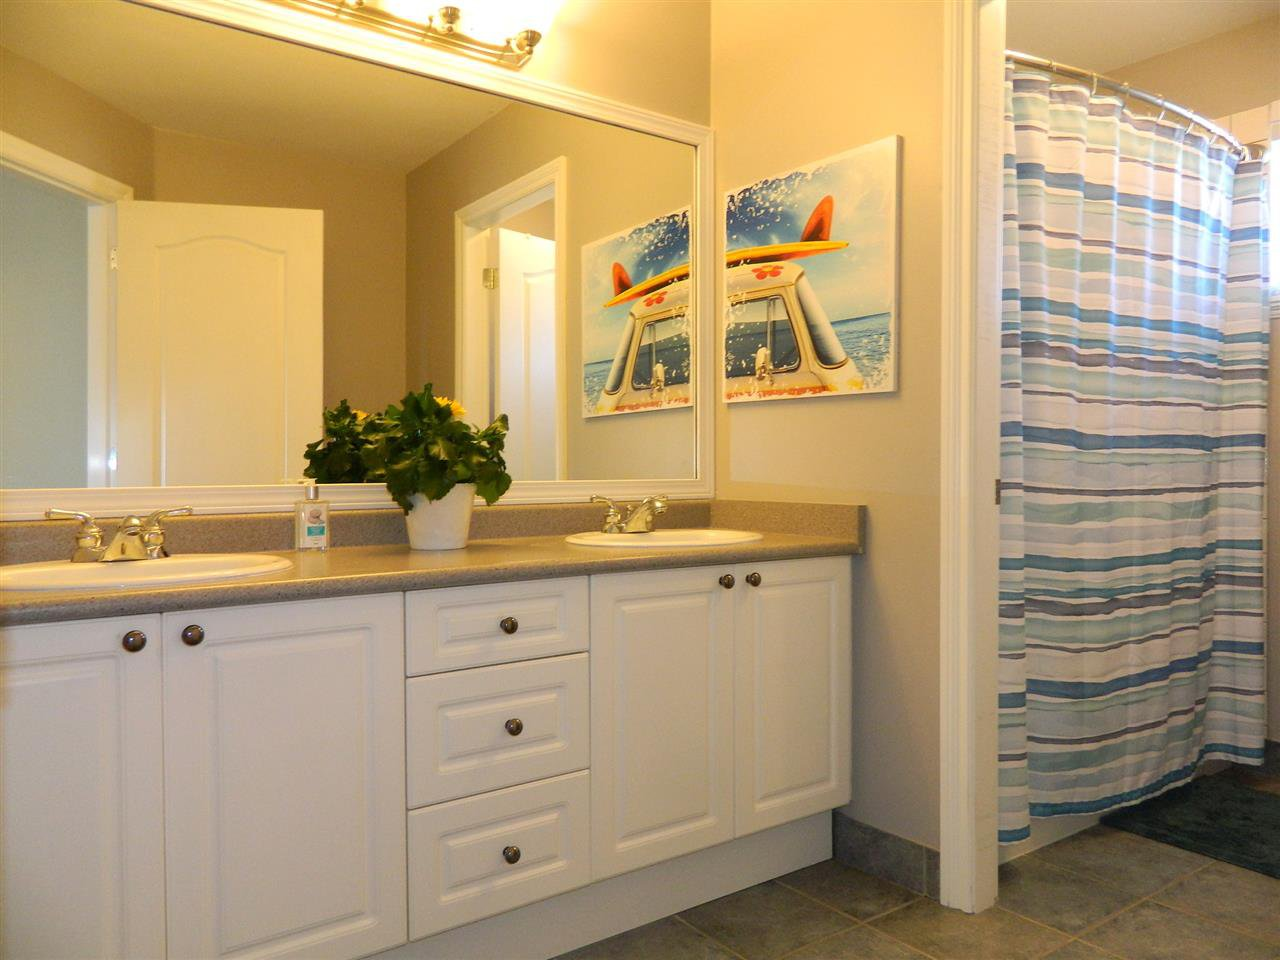 Photo 15: Photos: 24332 104 AVENUE in Maple Ridge: Albion House for sale : MLS®# R2051414